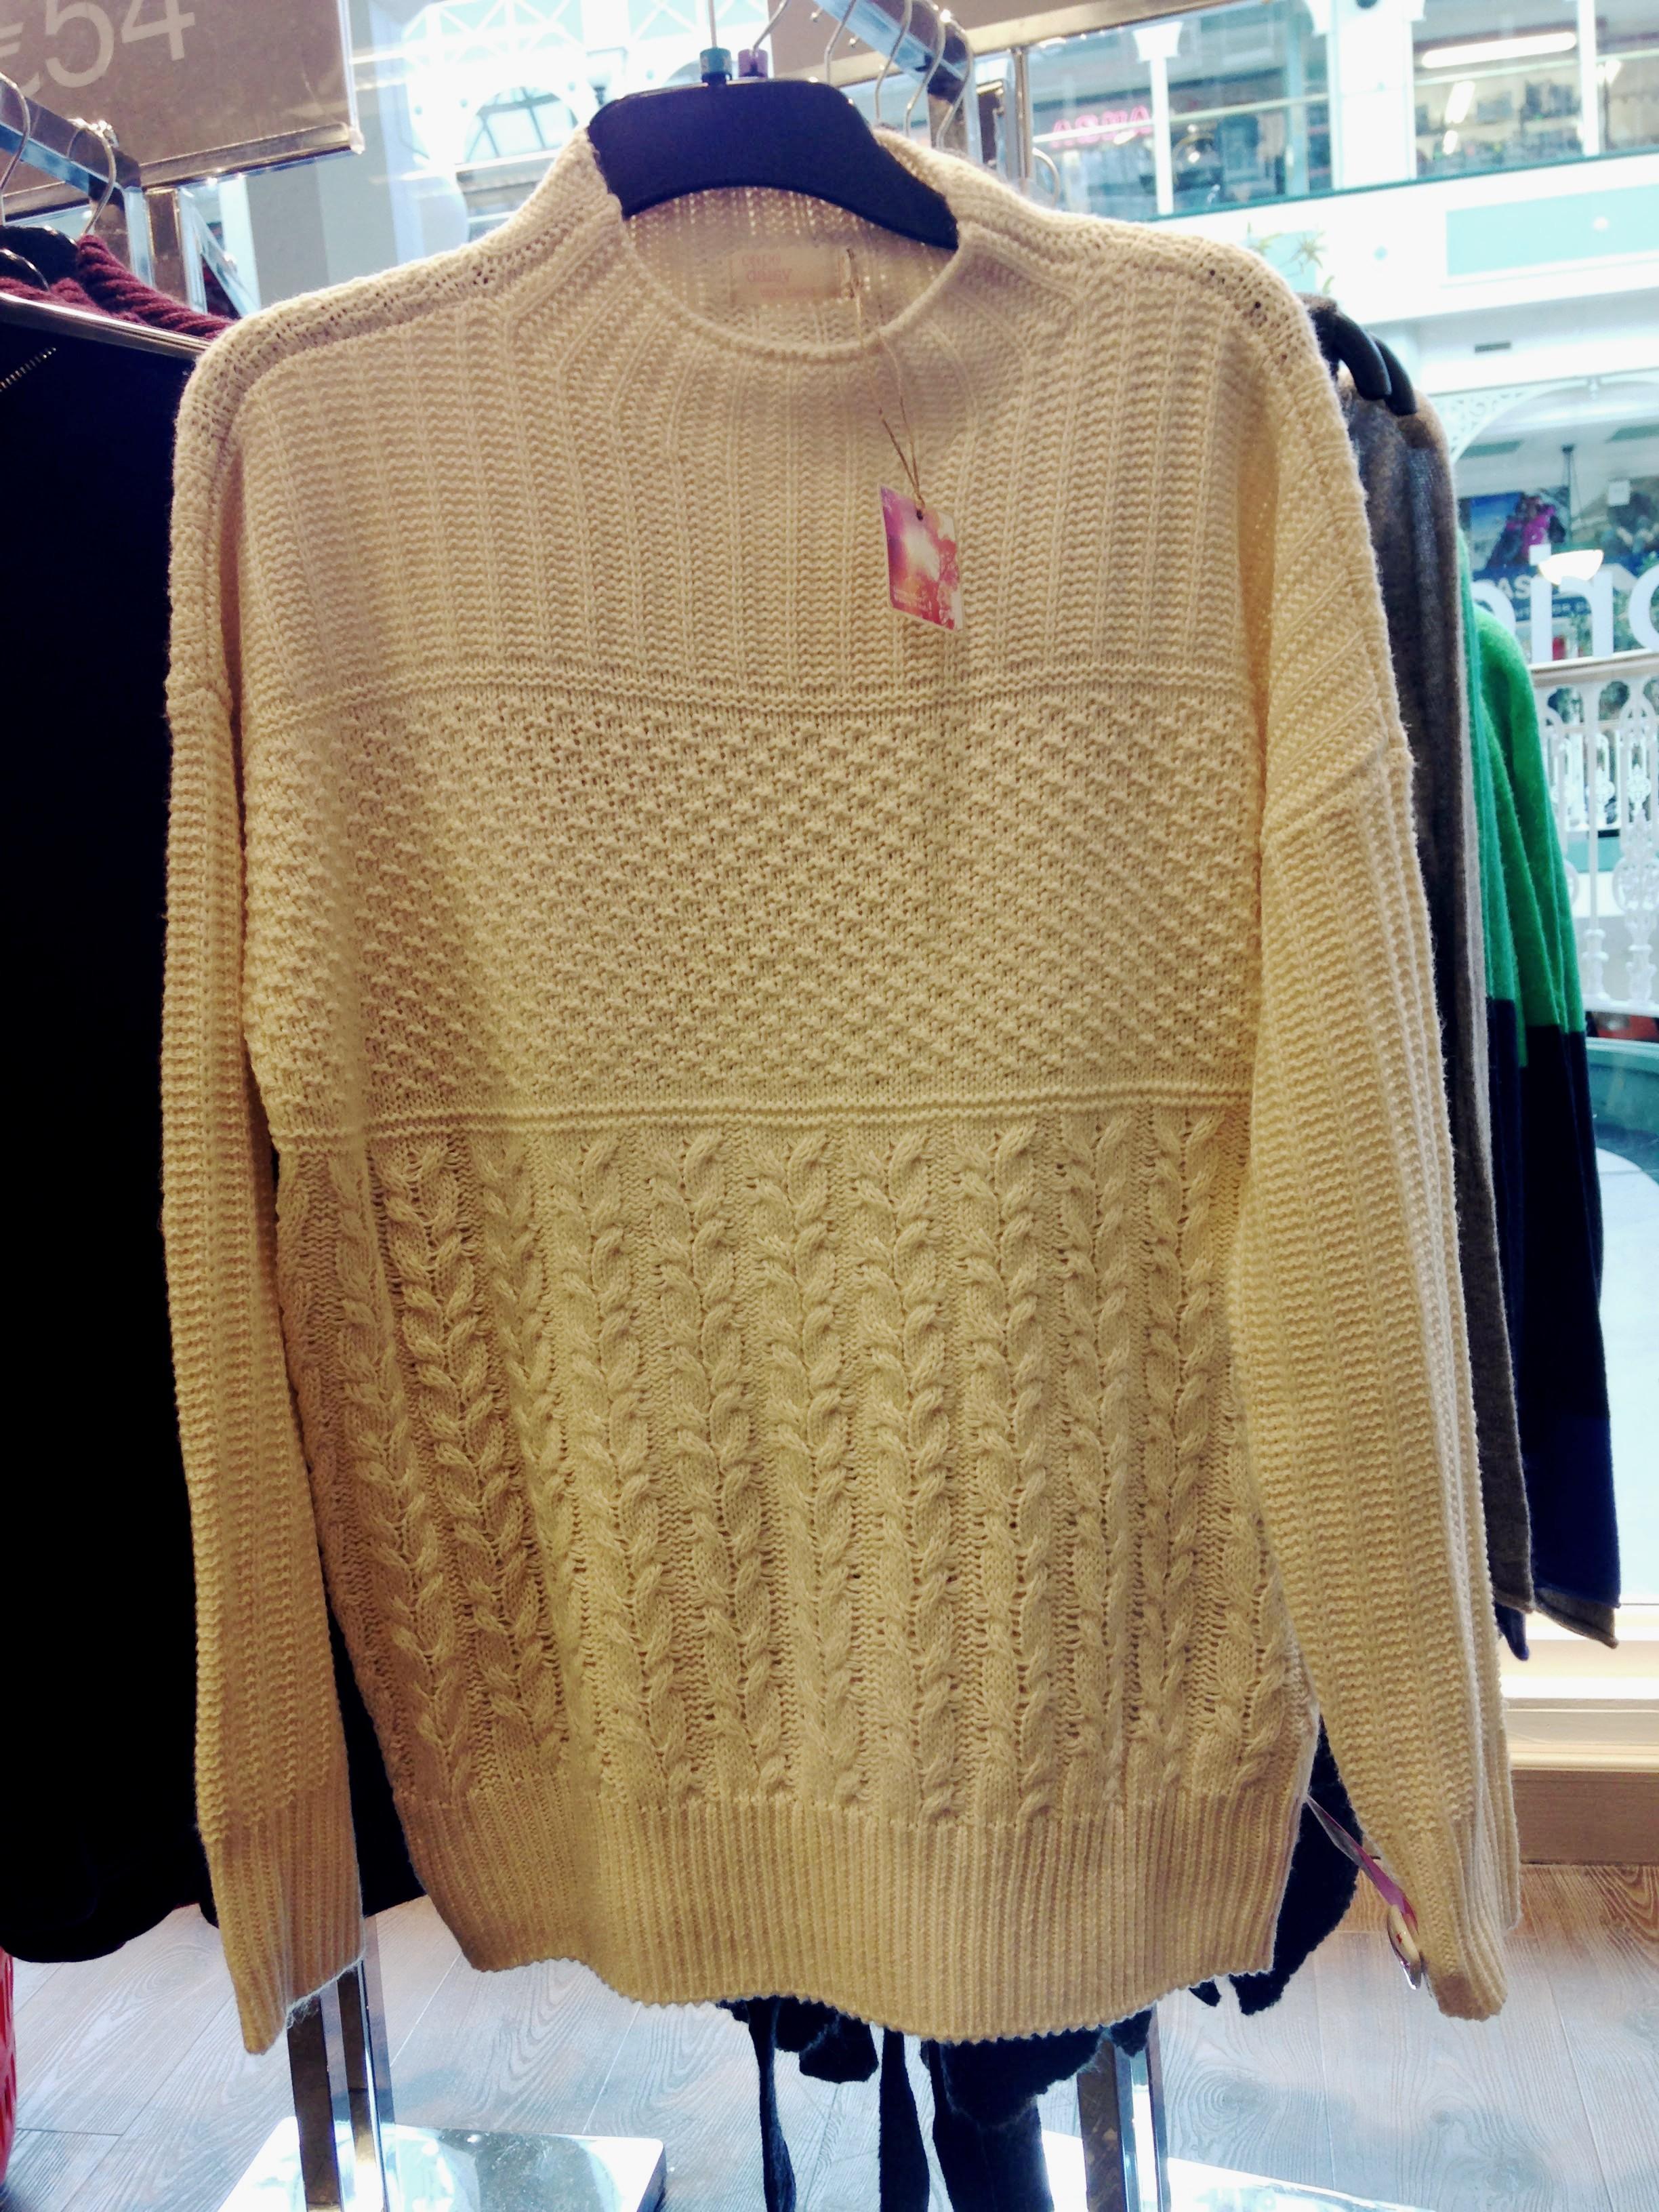 Tk Maxx! Cream traditional knit. €26.99